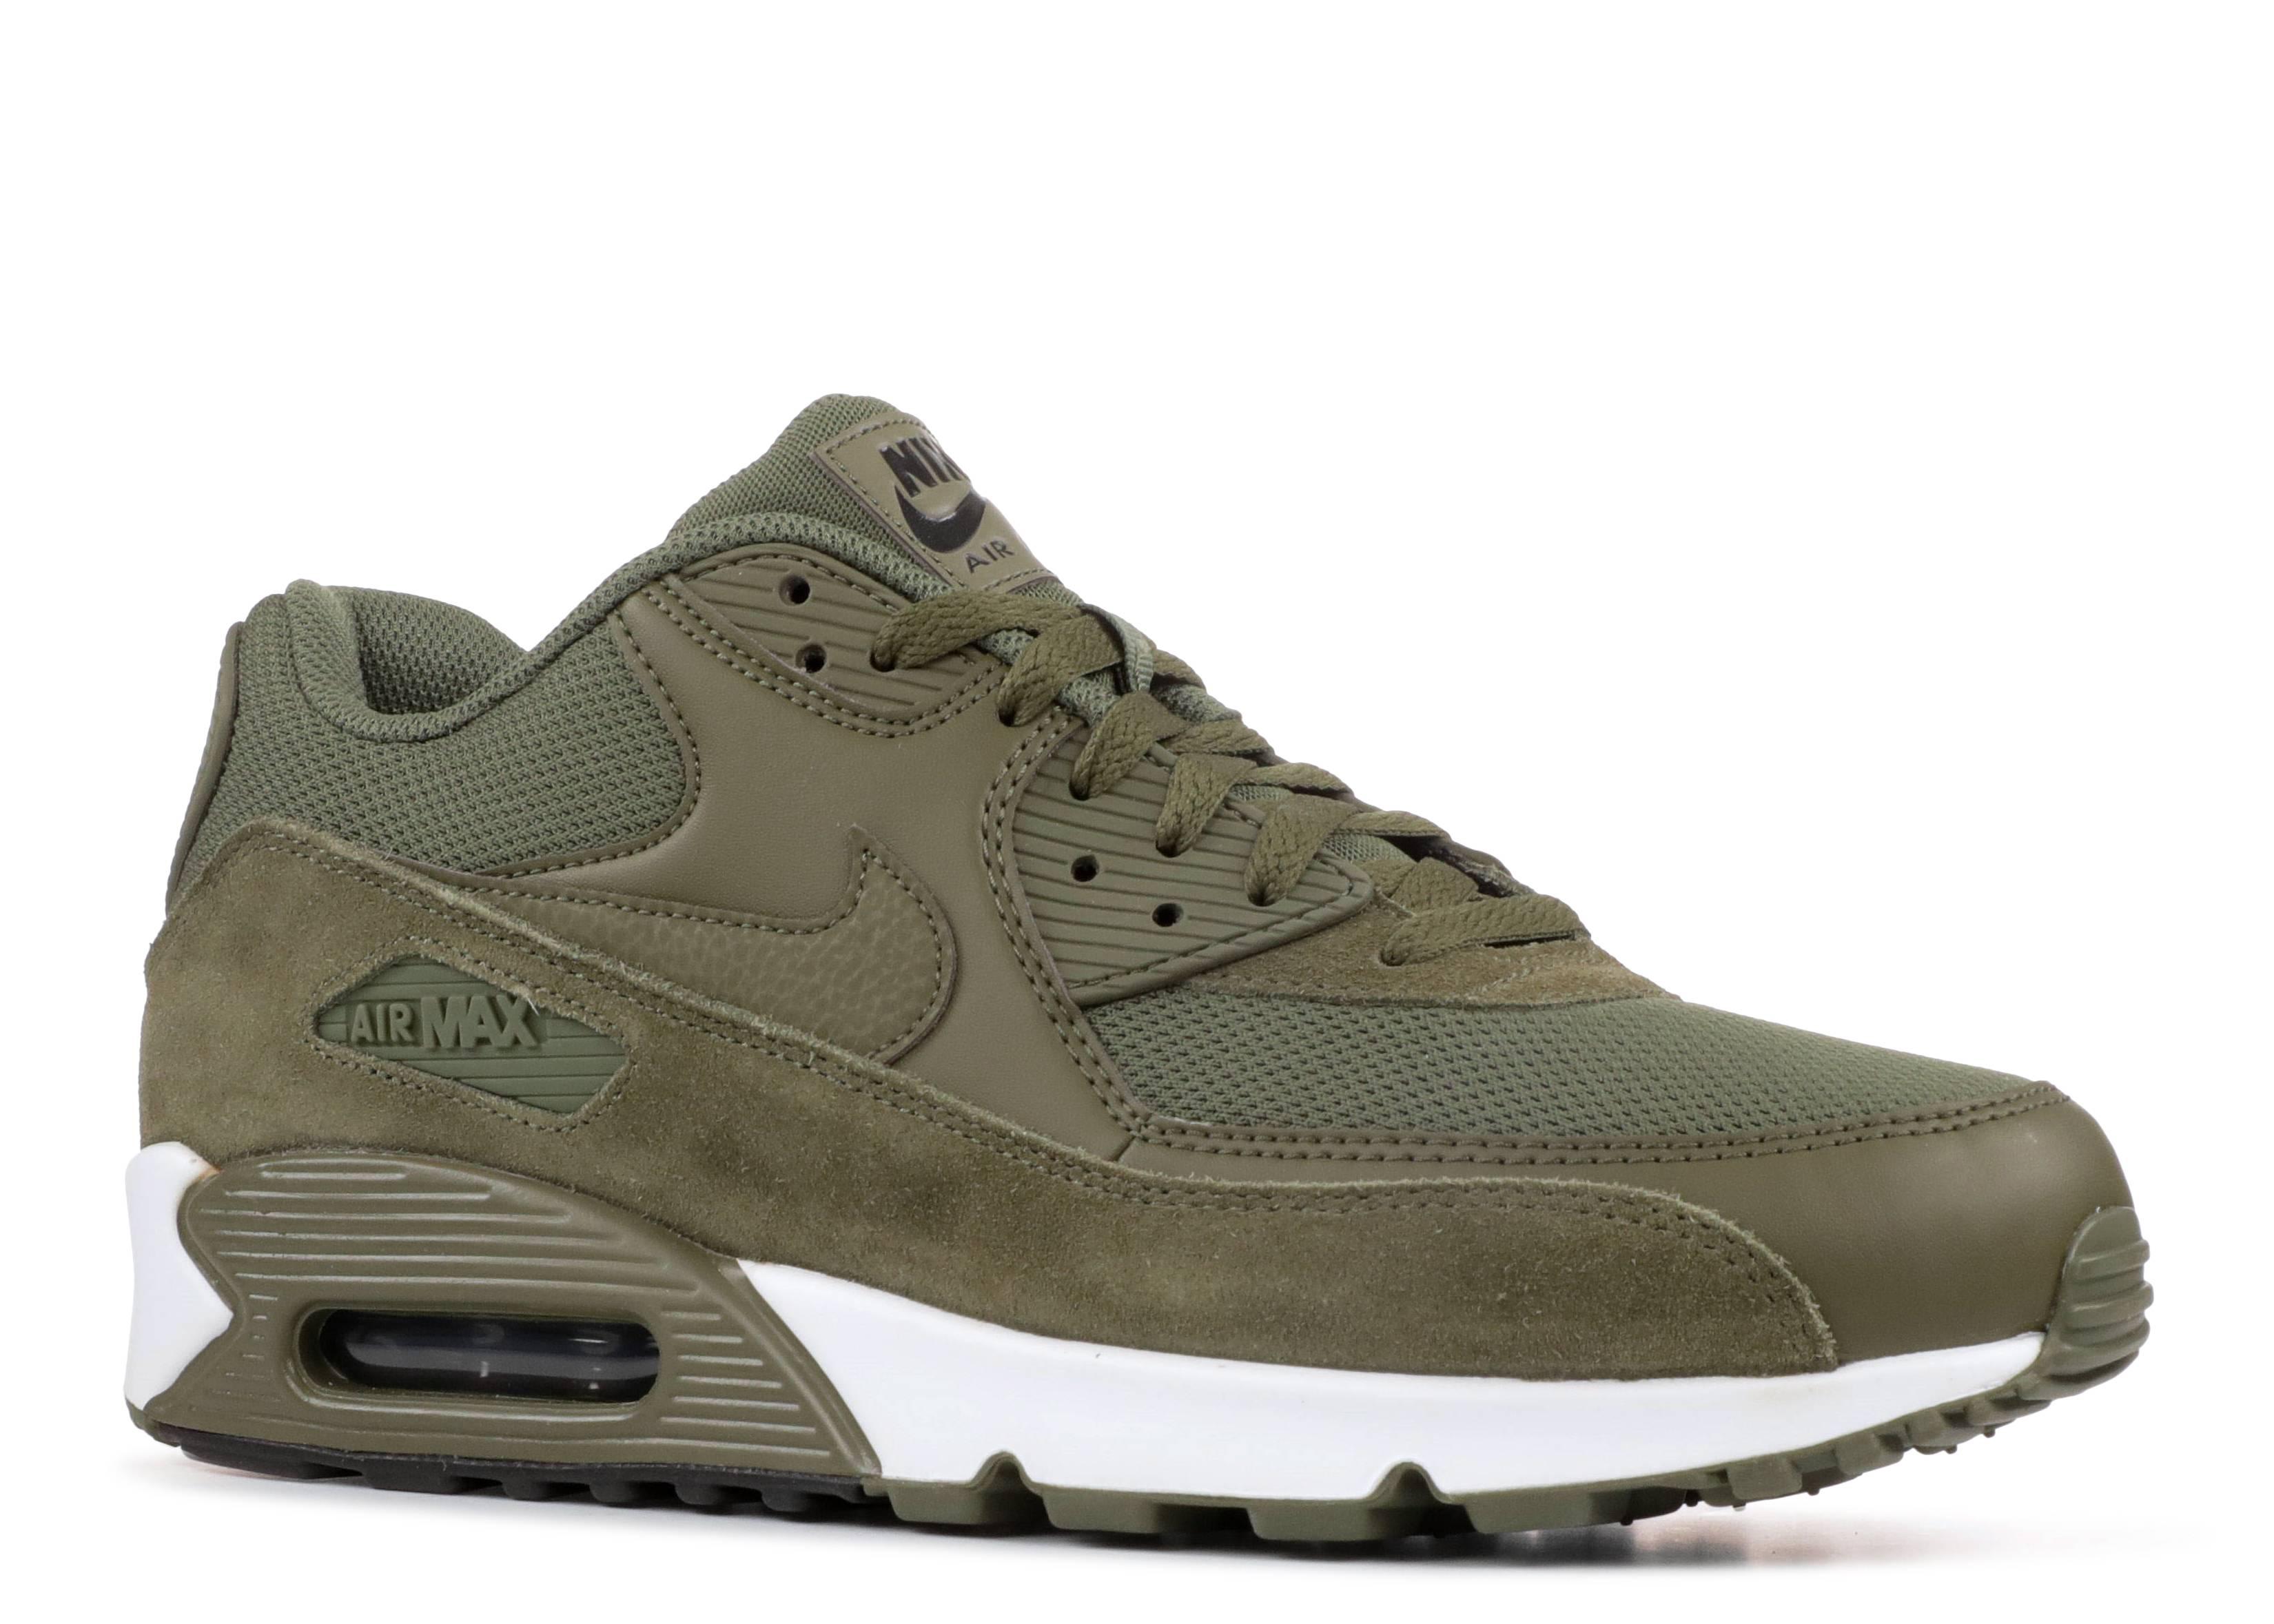 Air Max 90 Essential - Nike - 537384 201 - dark green/medium olive ...